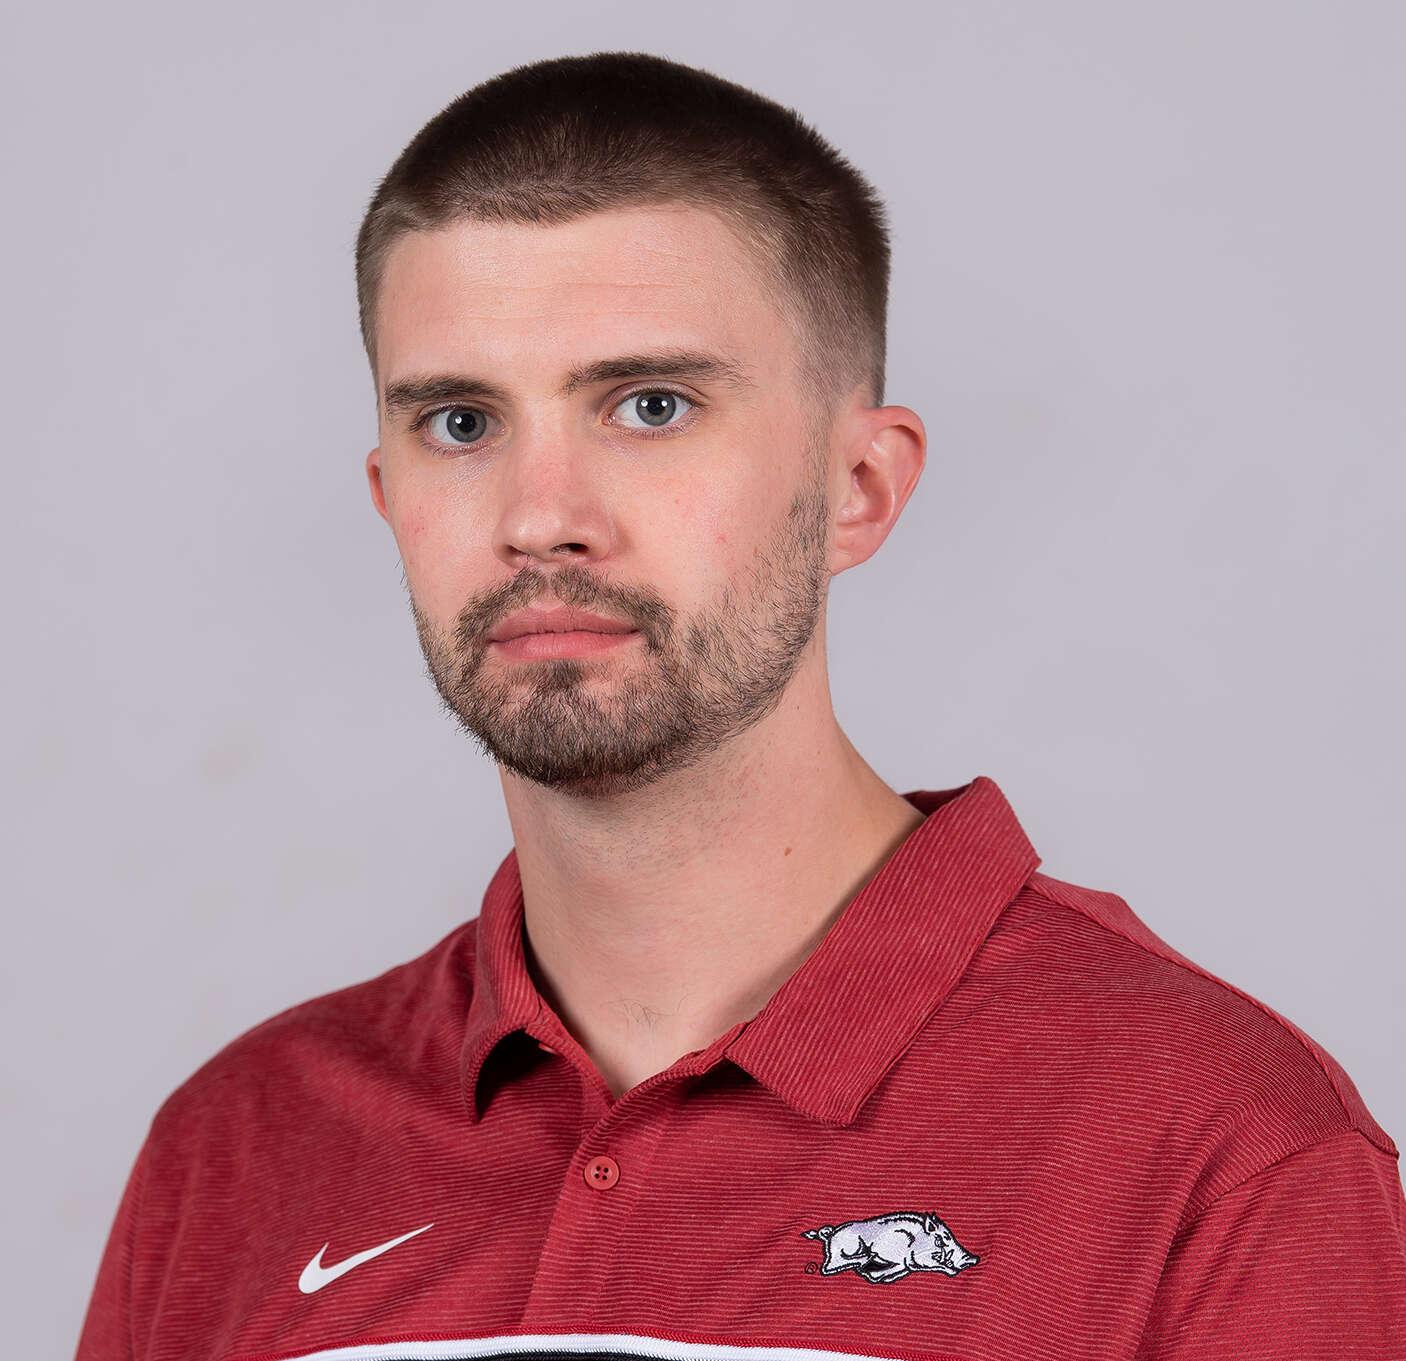 Patrick Ackerman - Men's Basketball - Arkansas Razorbacks